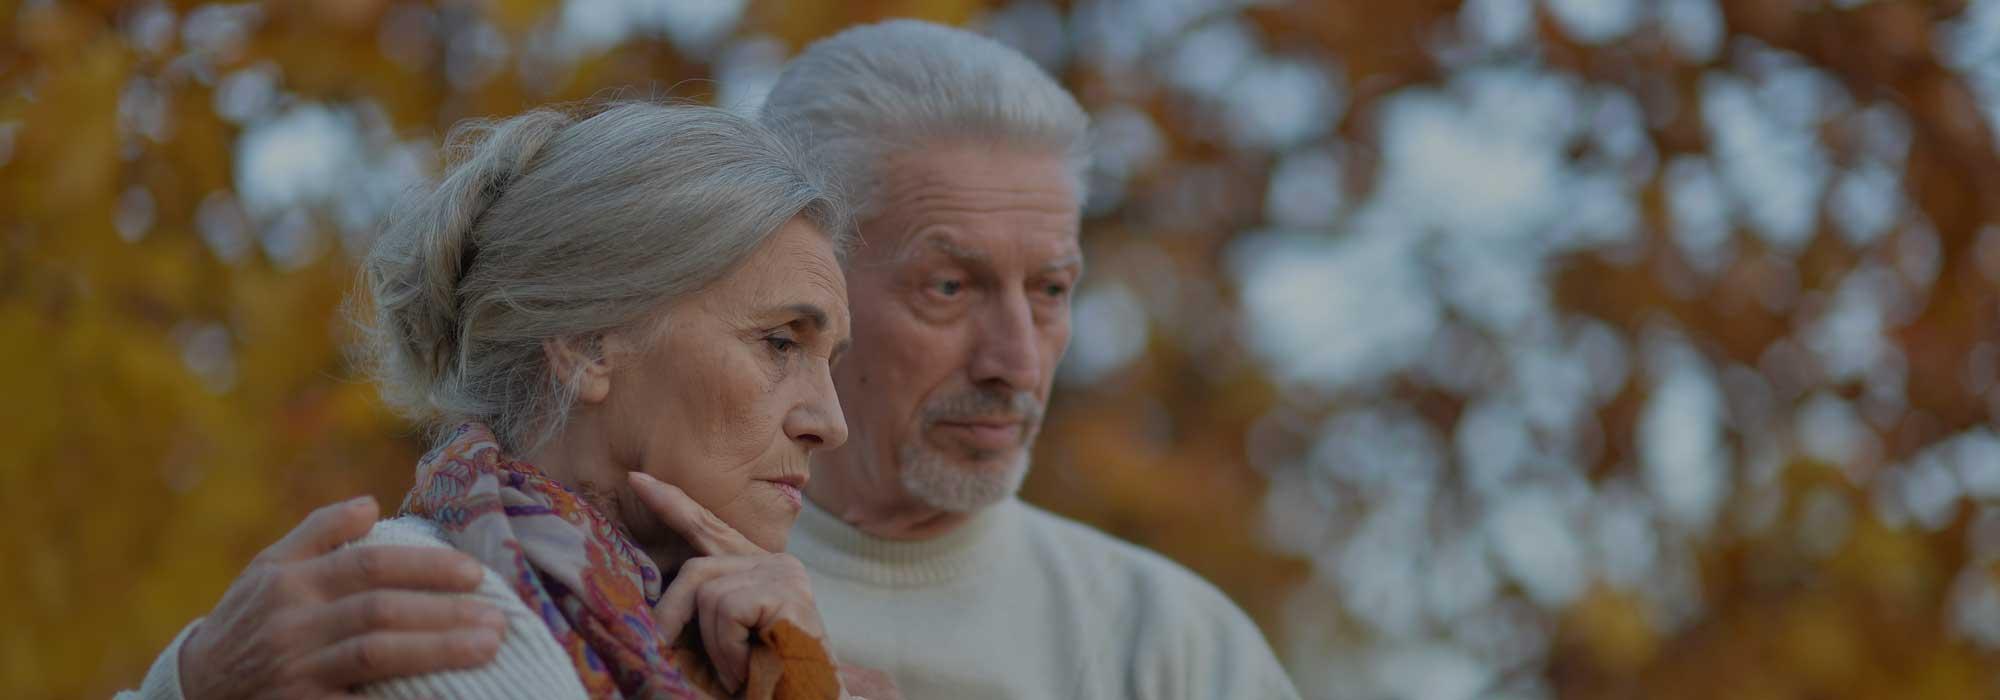 Senior couple stood outside looking unhappy